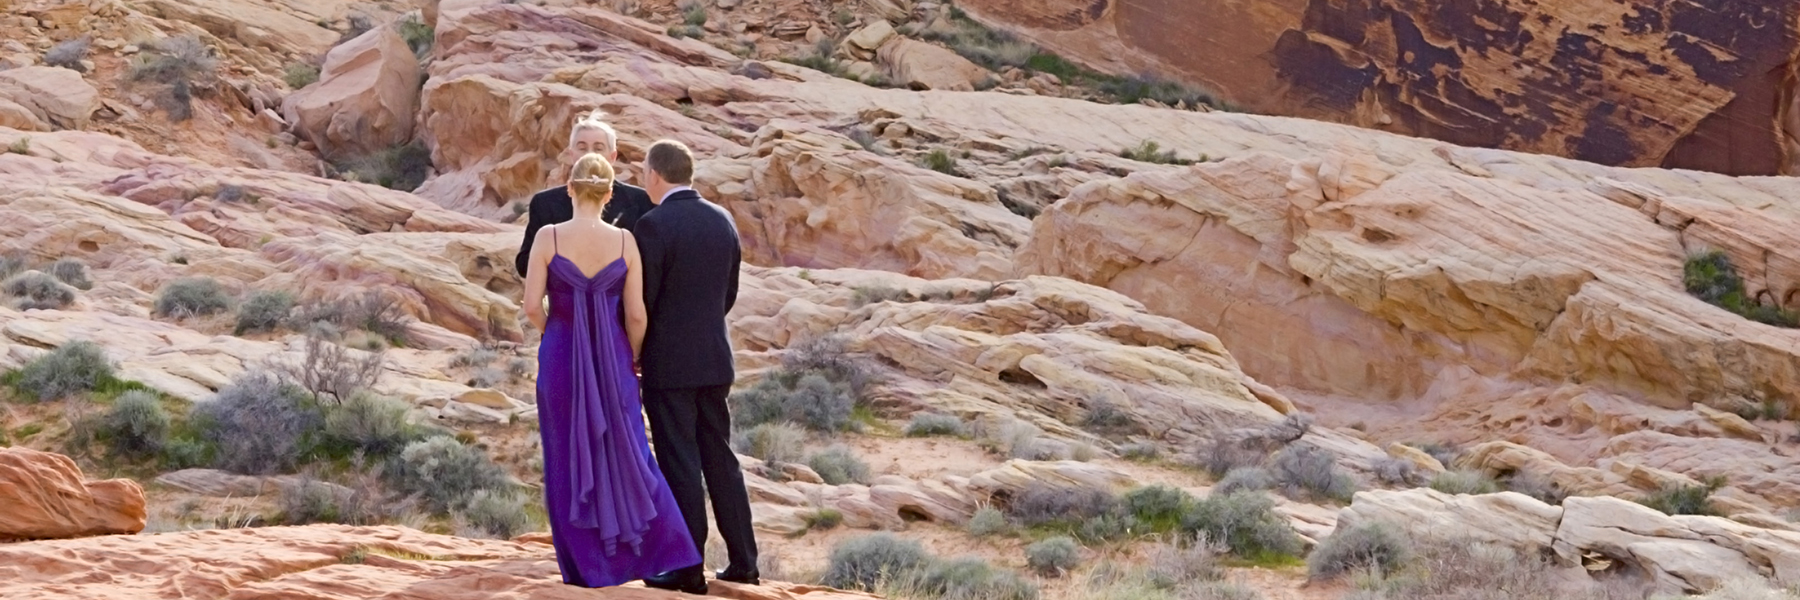 nevada cover - best beach wedding venues in california